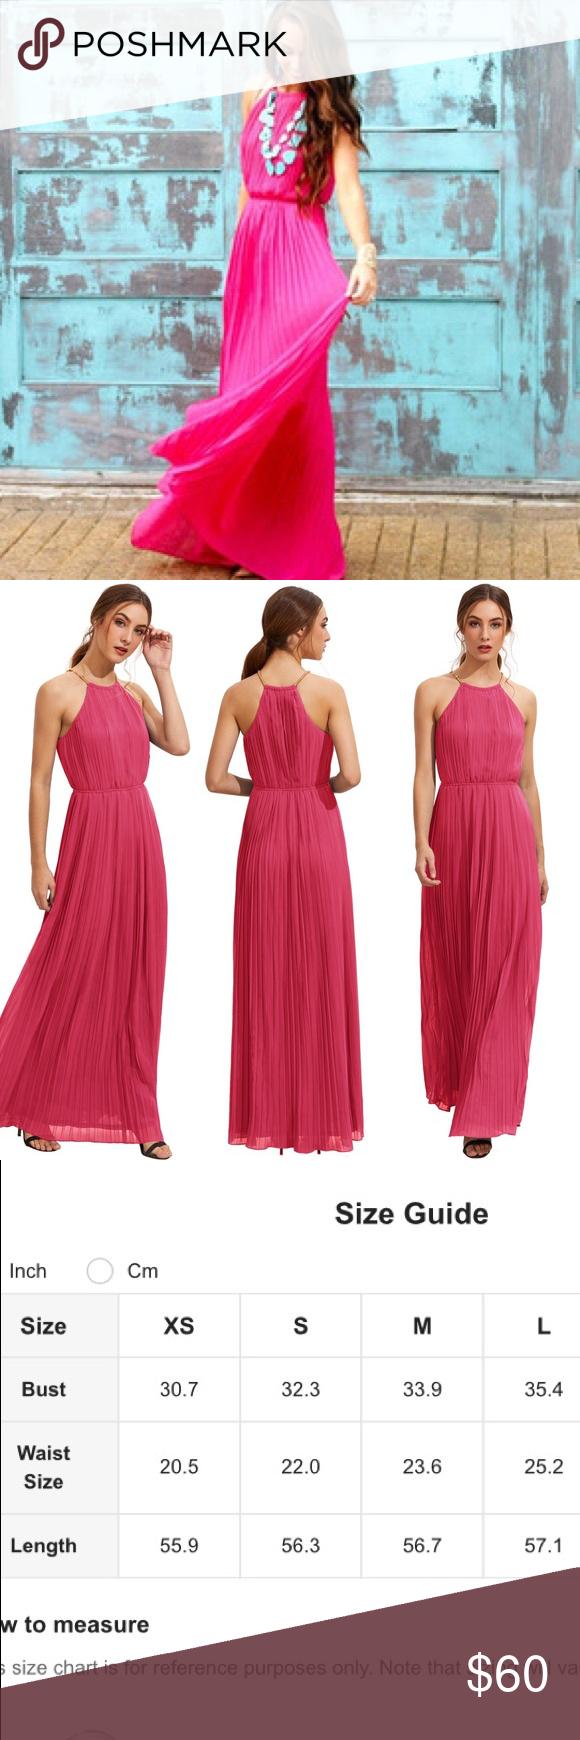 Gorgeous bright pink halter pleated maxi dress school dances